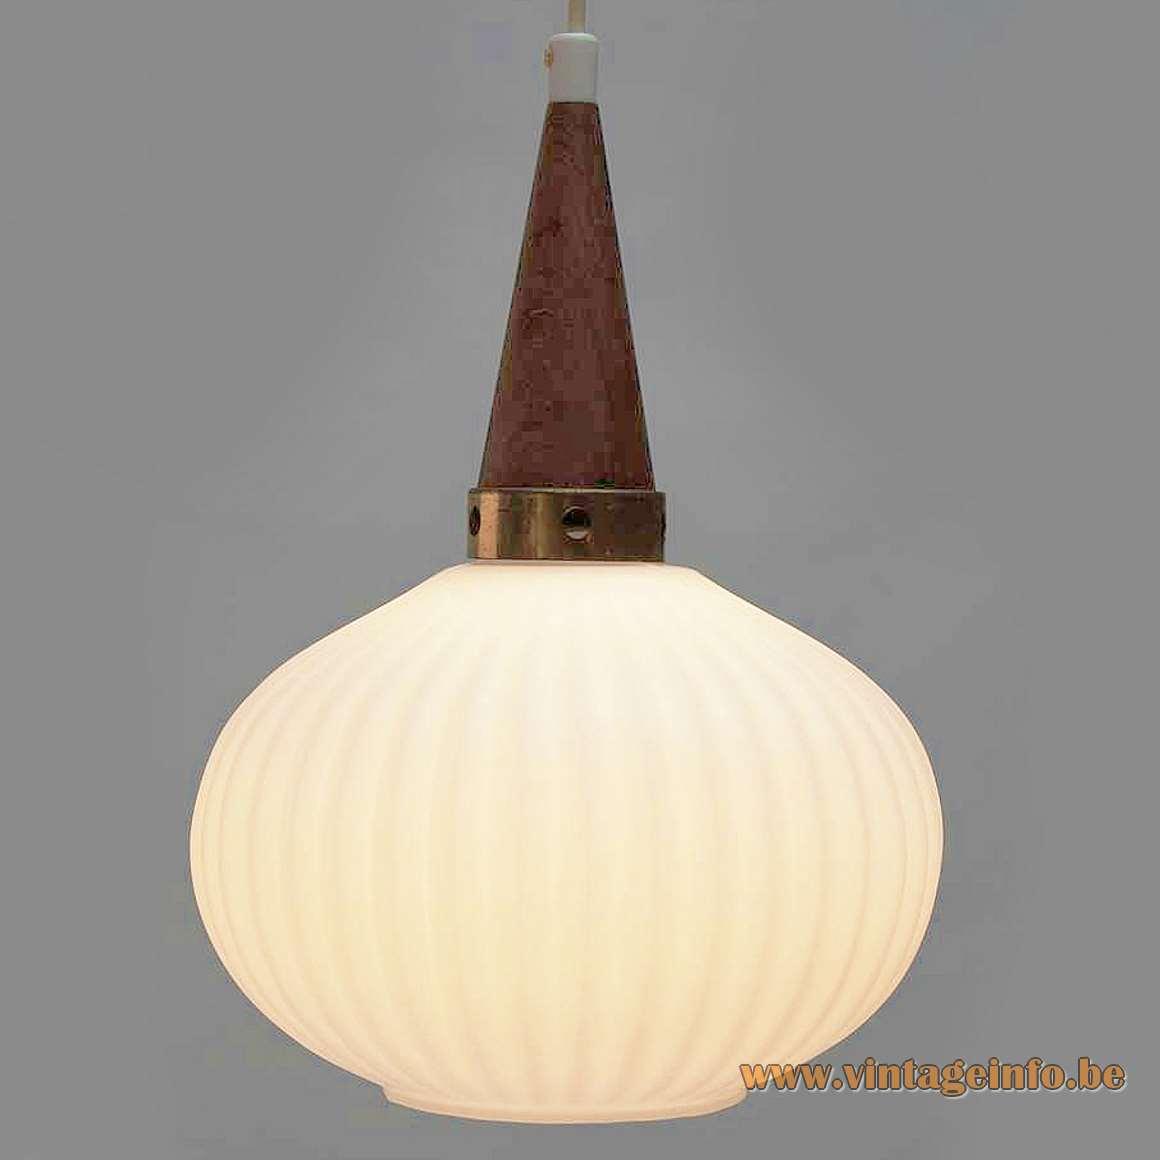 Cascade 1950s chandelier Louis Kalff Philips style pendants ribbed opal glass wood brass 1960s Massive Belgium